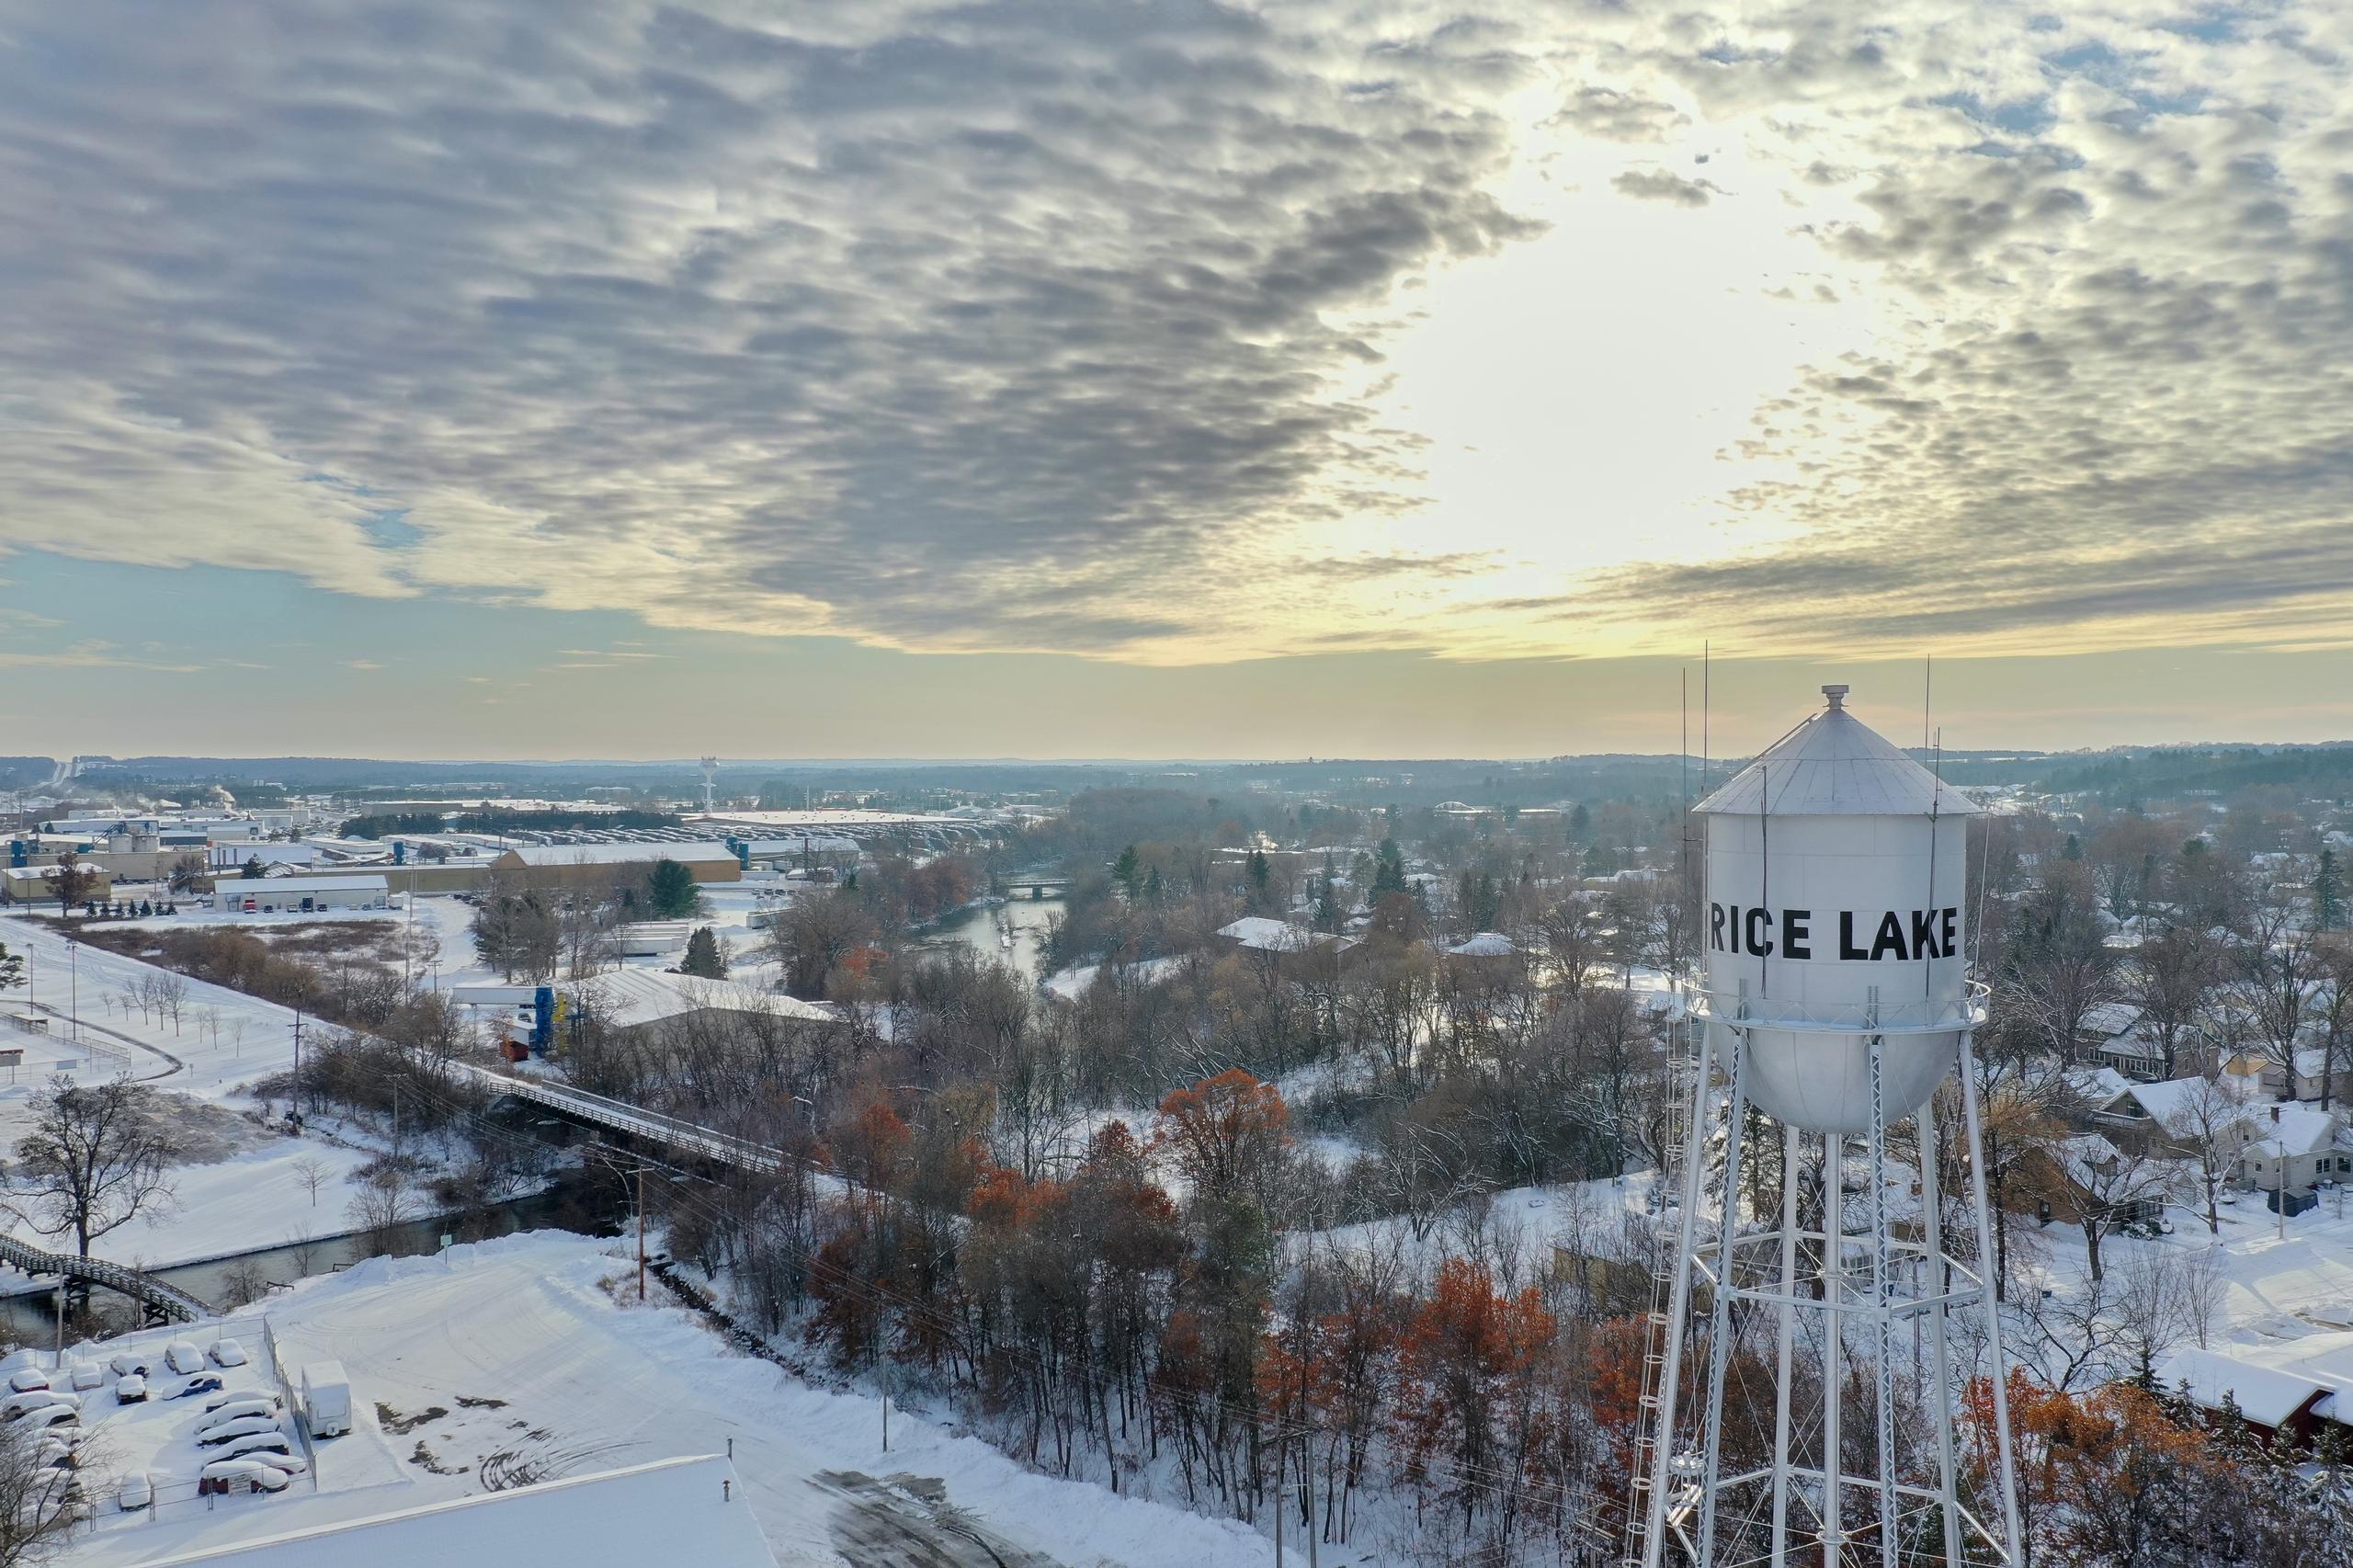 Rice Lake Area Picture